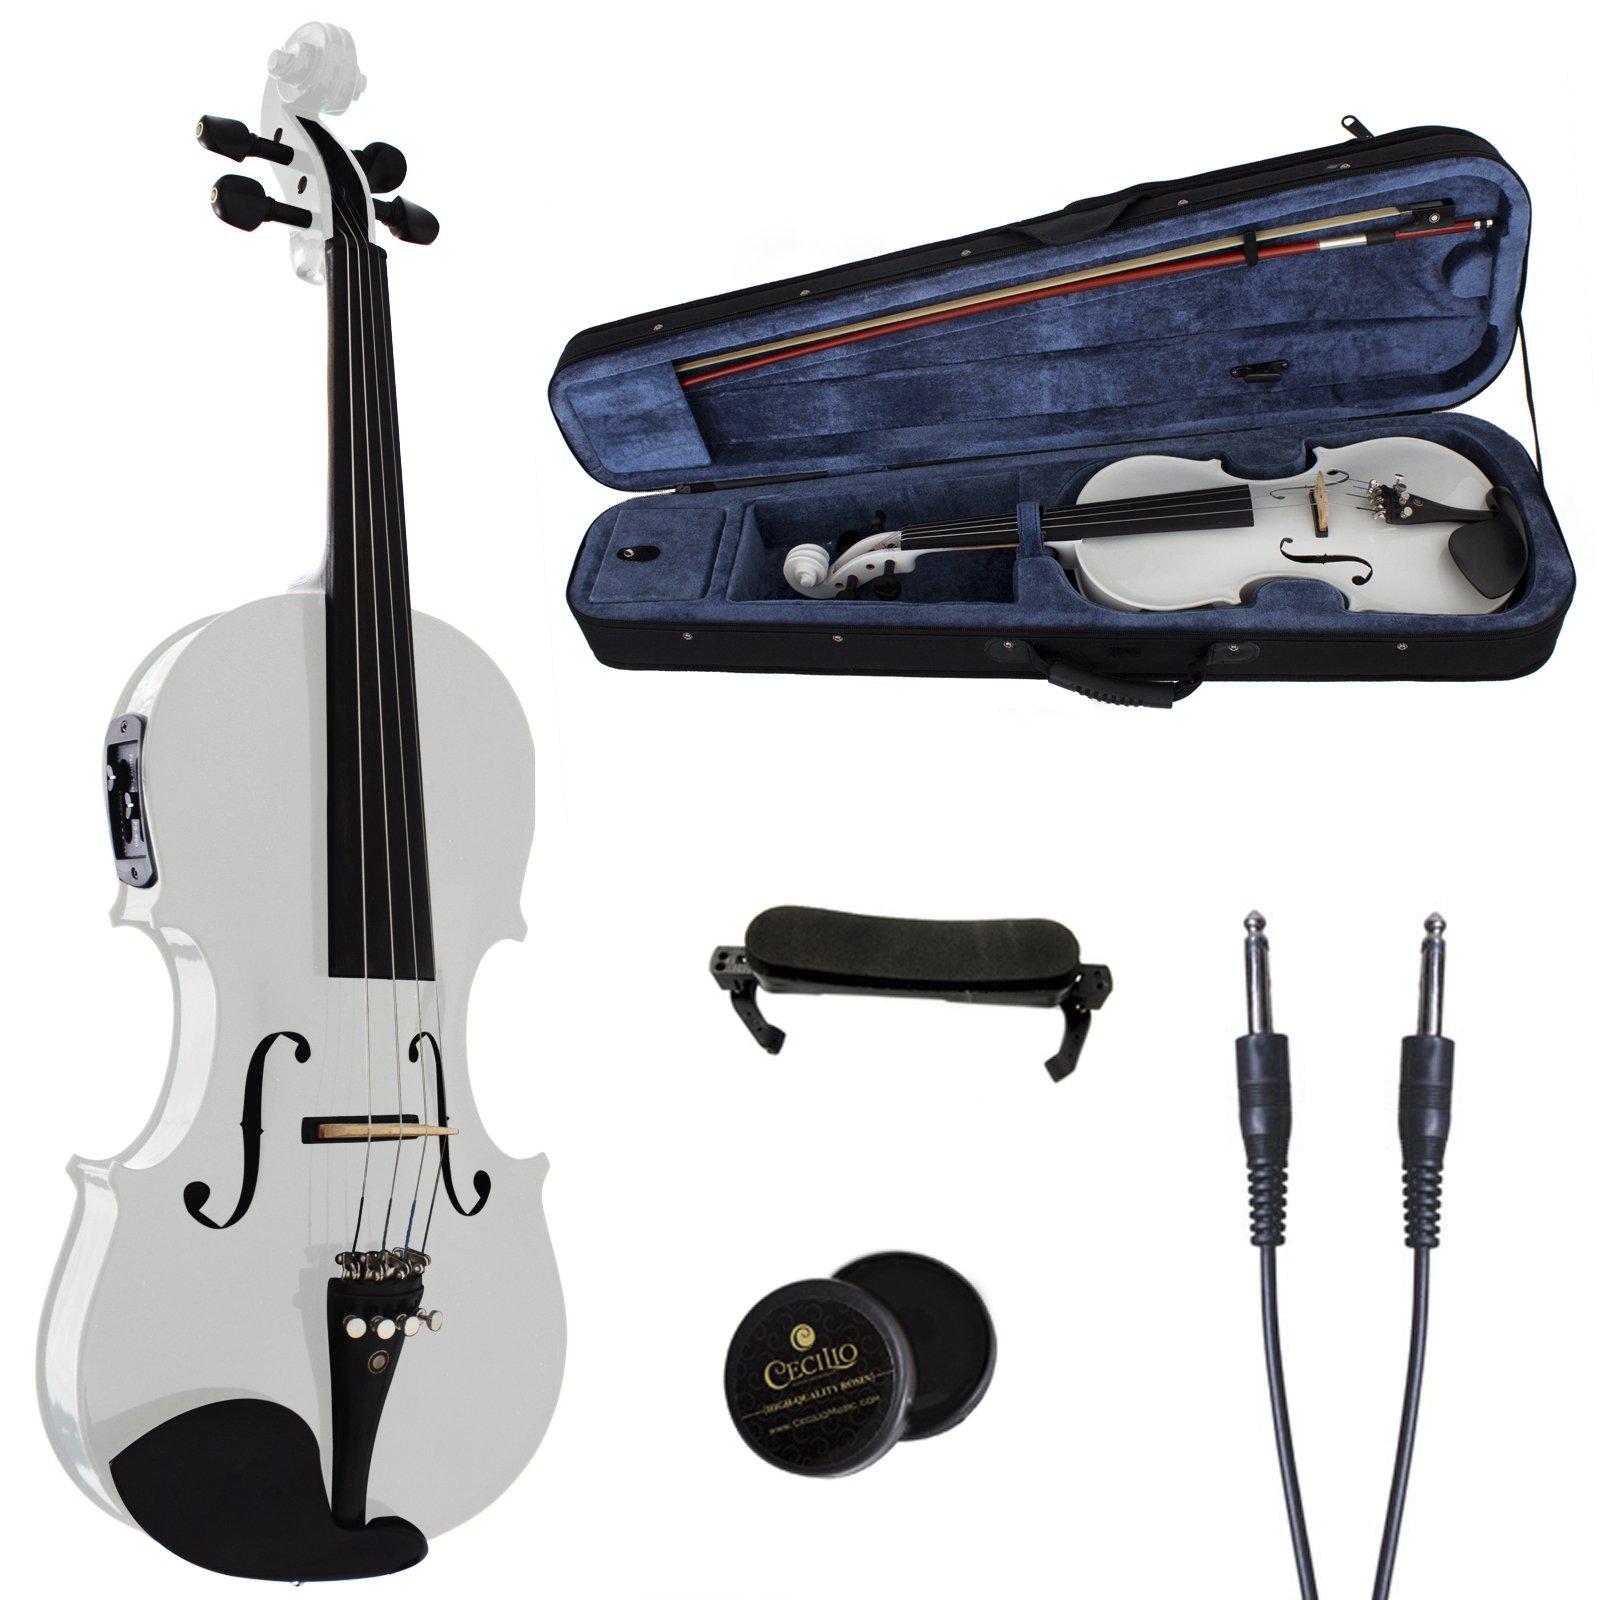 Cecilio 4/4 CVNAE-White+SR Ebony Fitted Acoustic/Electric Violin in Pearl White